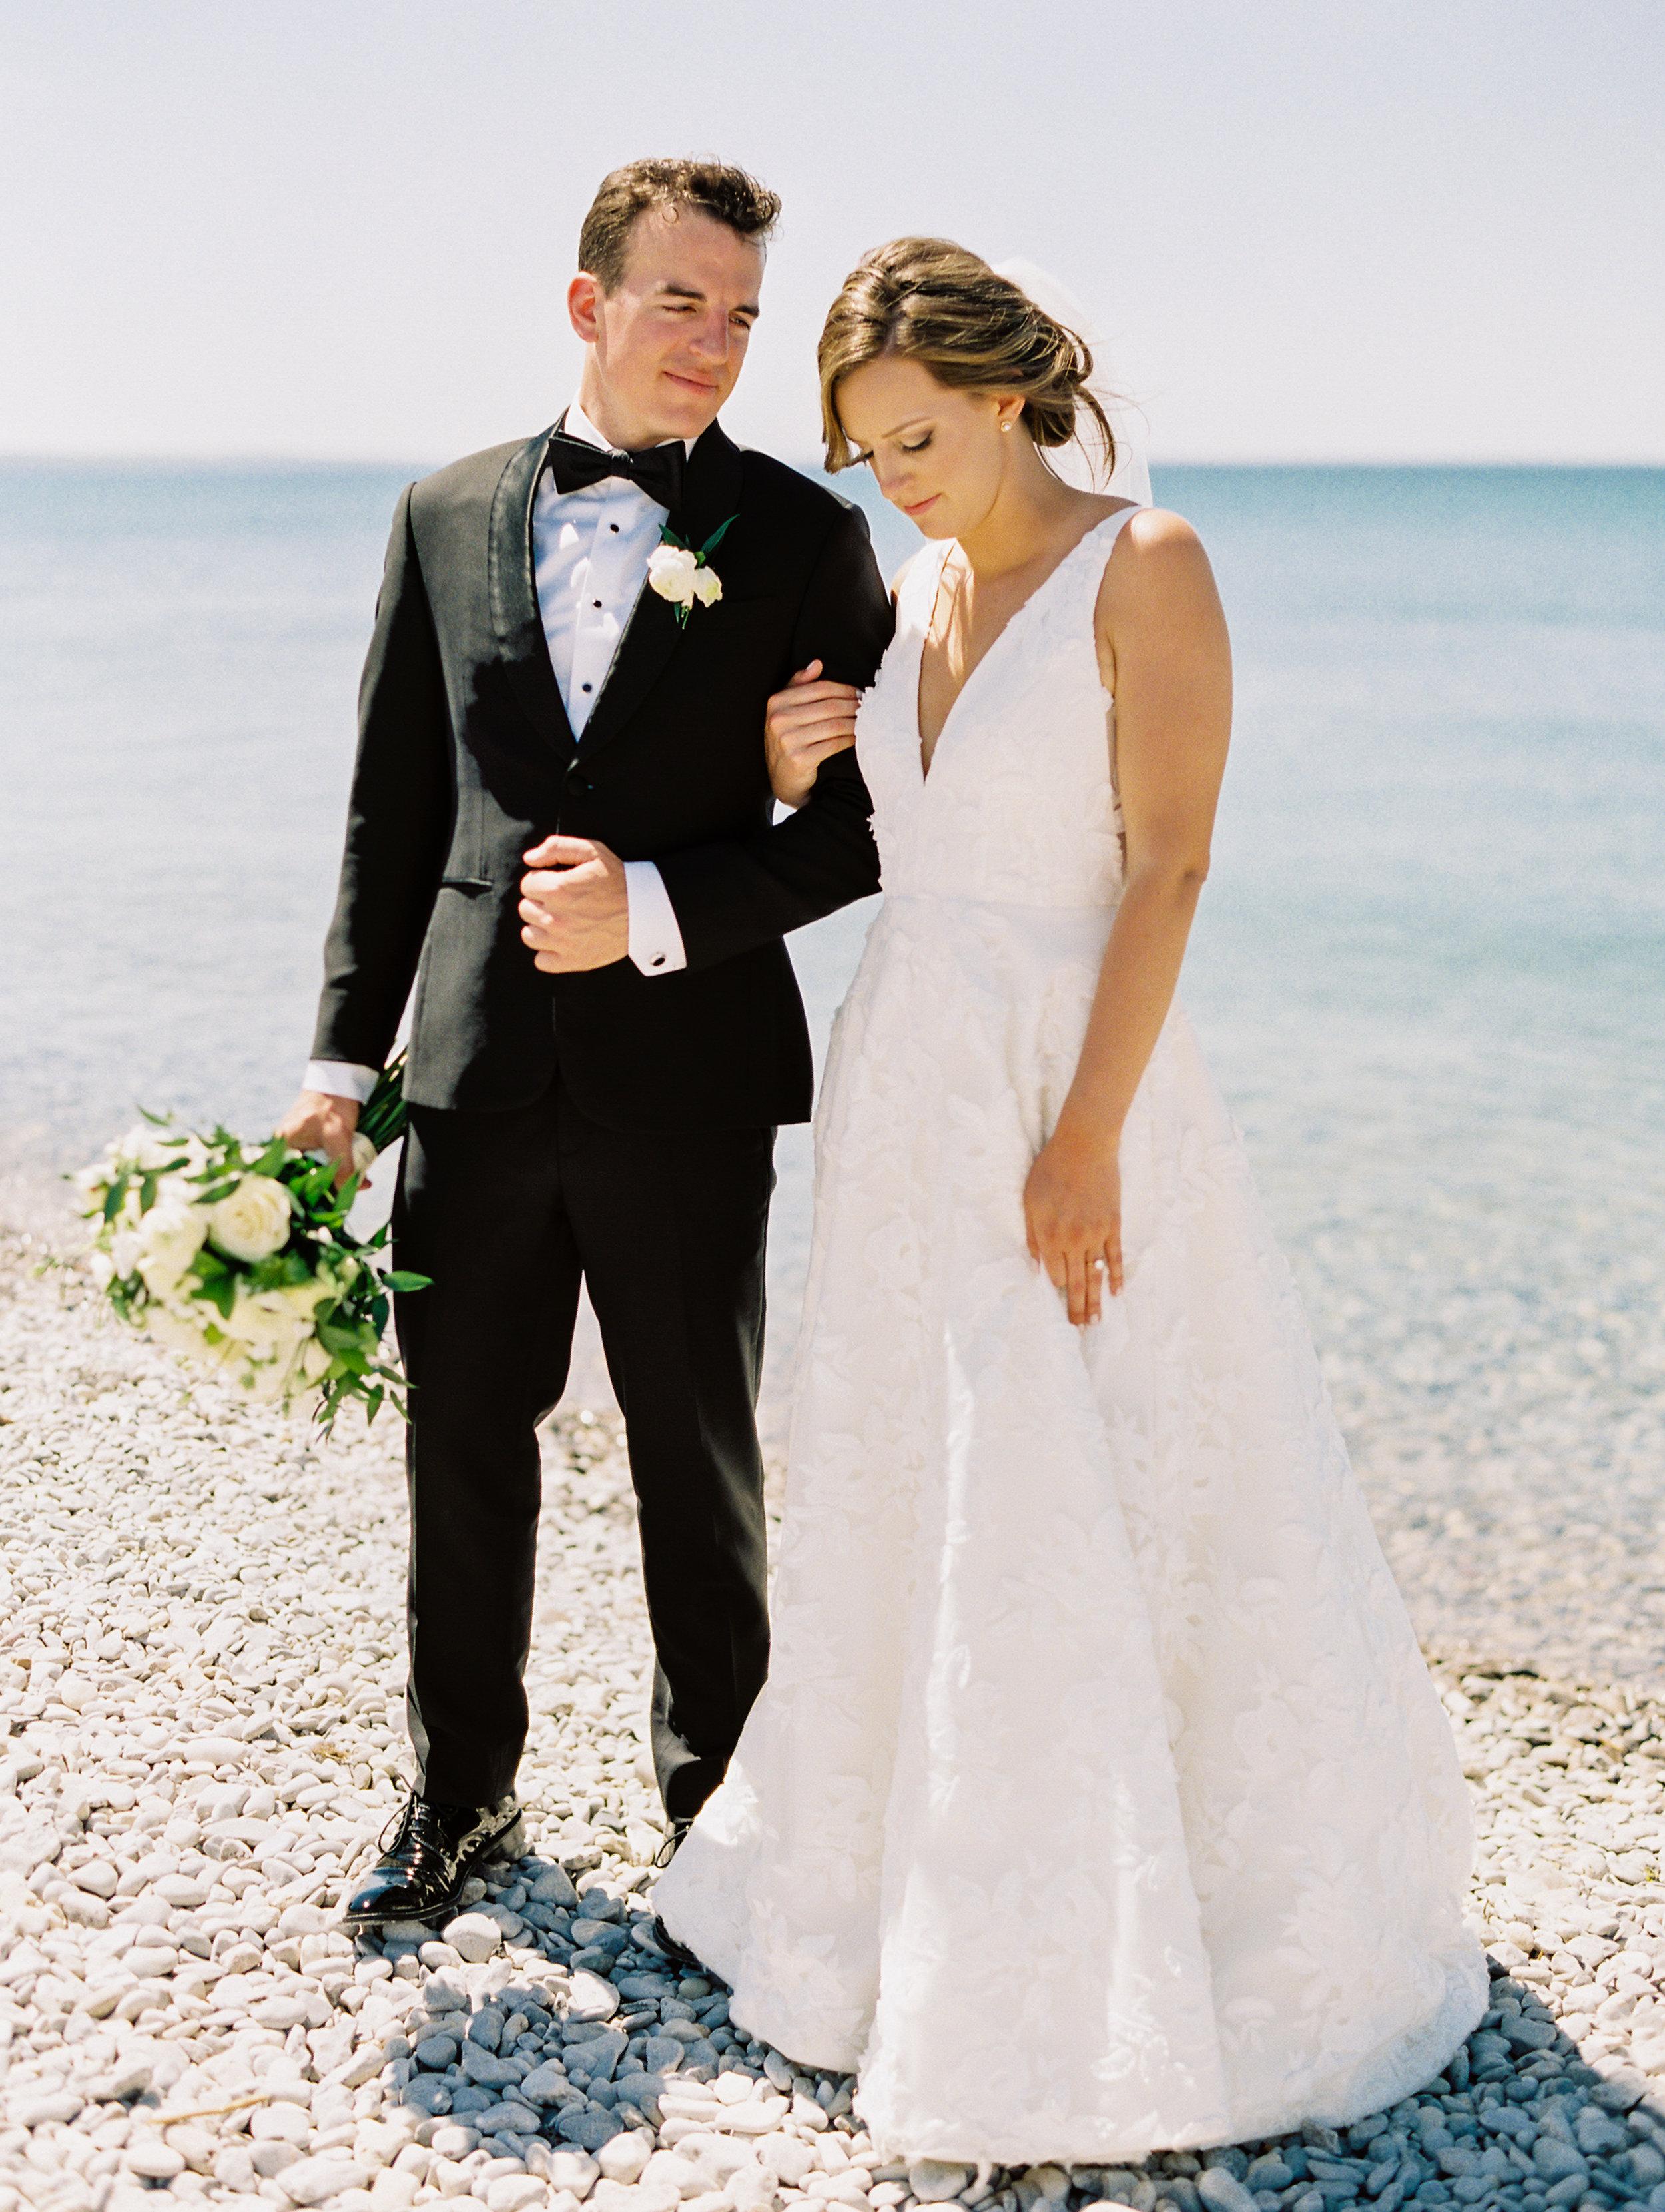 DeGuilio+Wedding+Bridal+Partyf-100.jpg